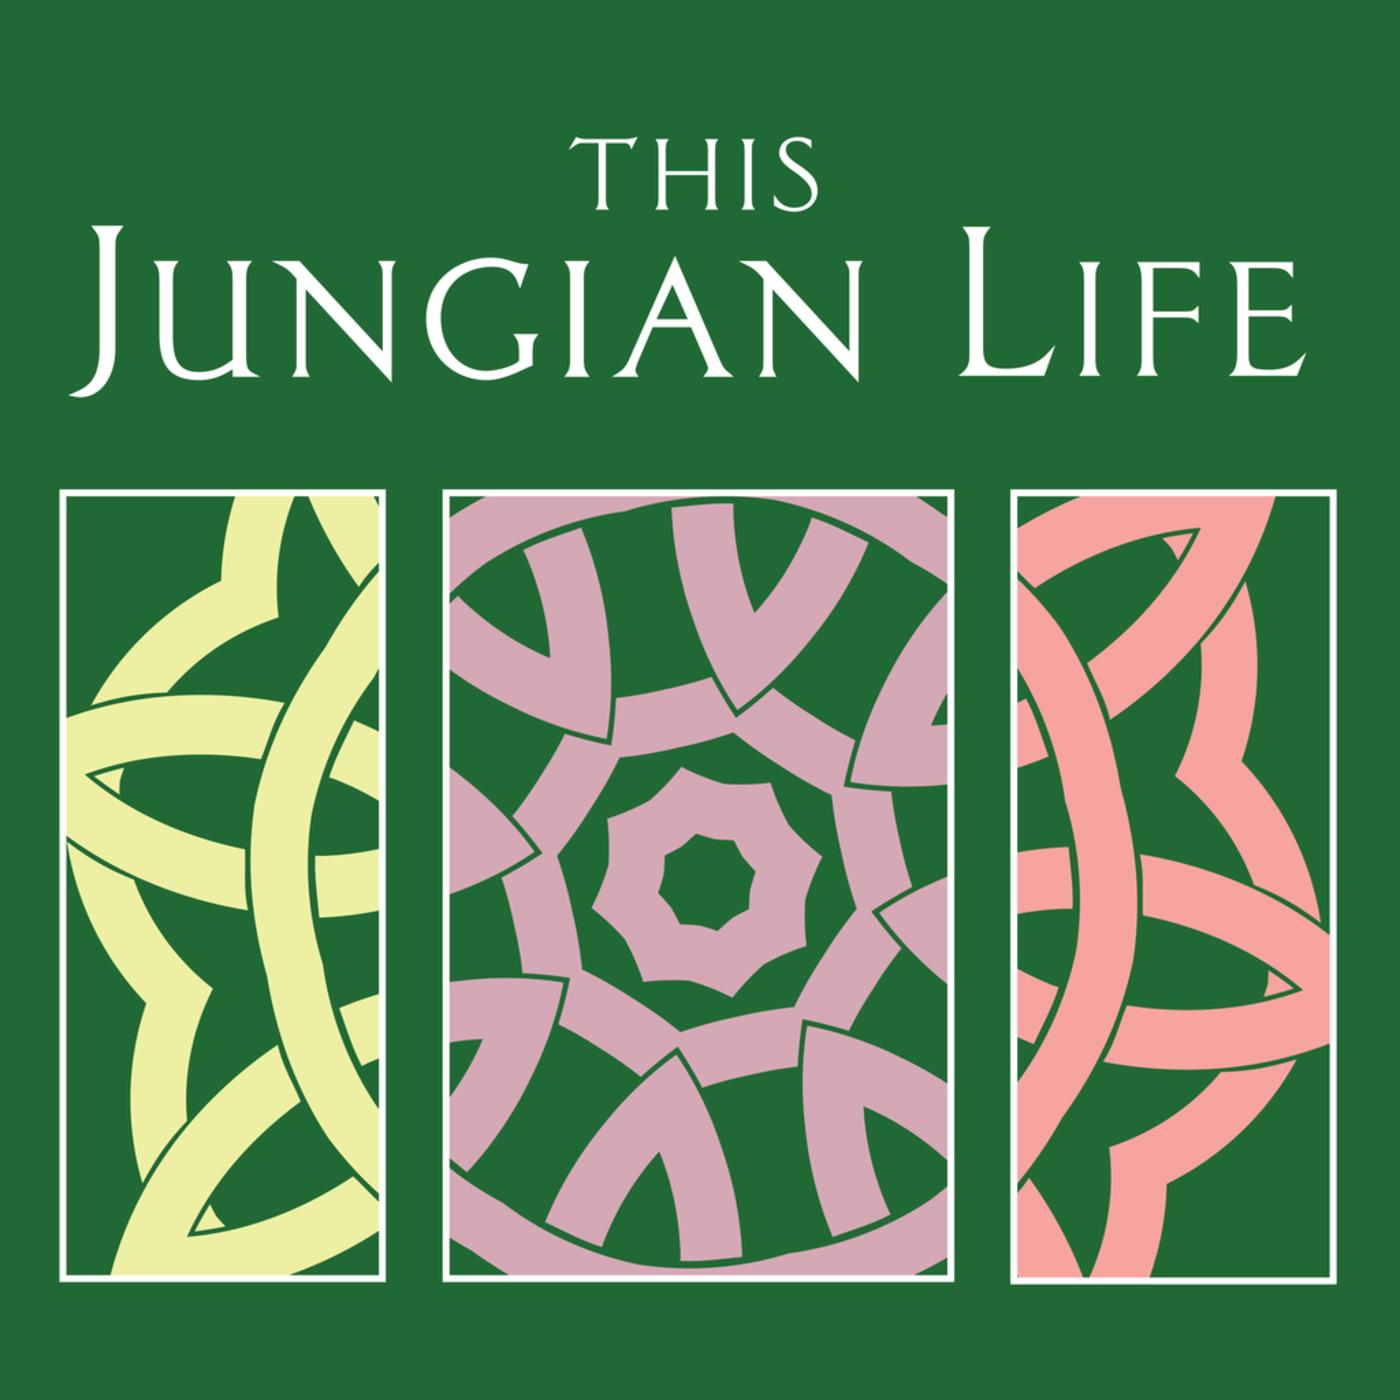 This Jungian Life show art